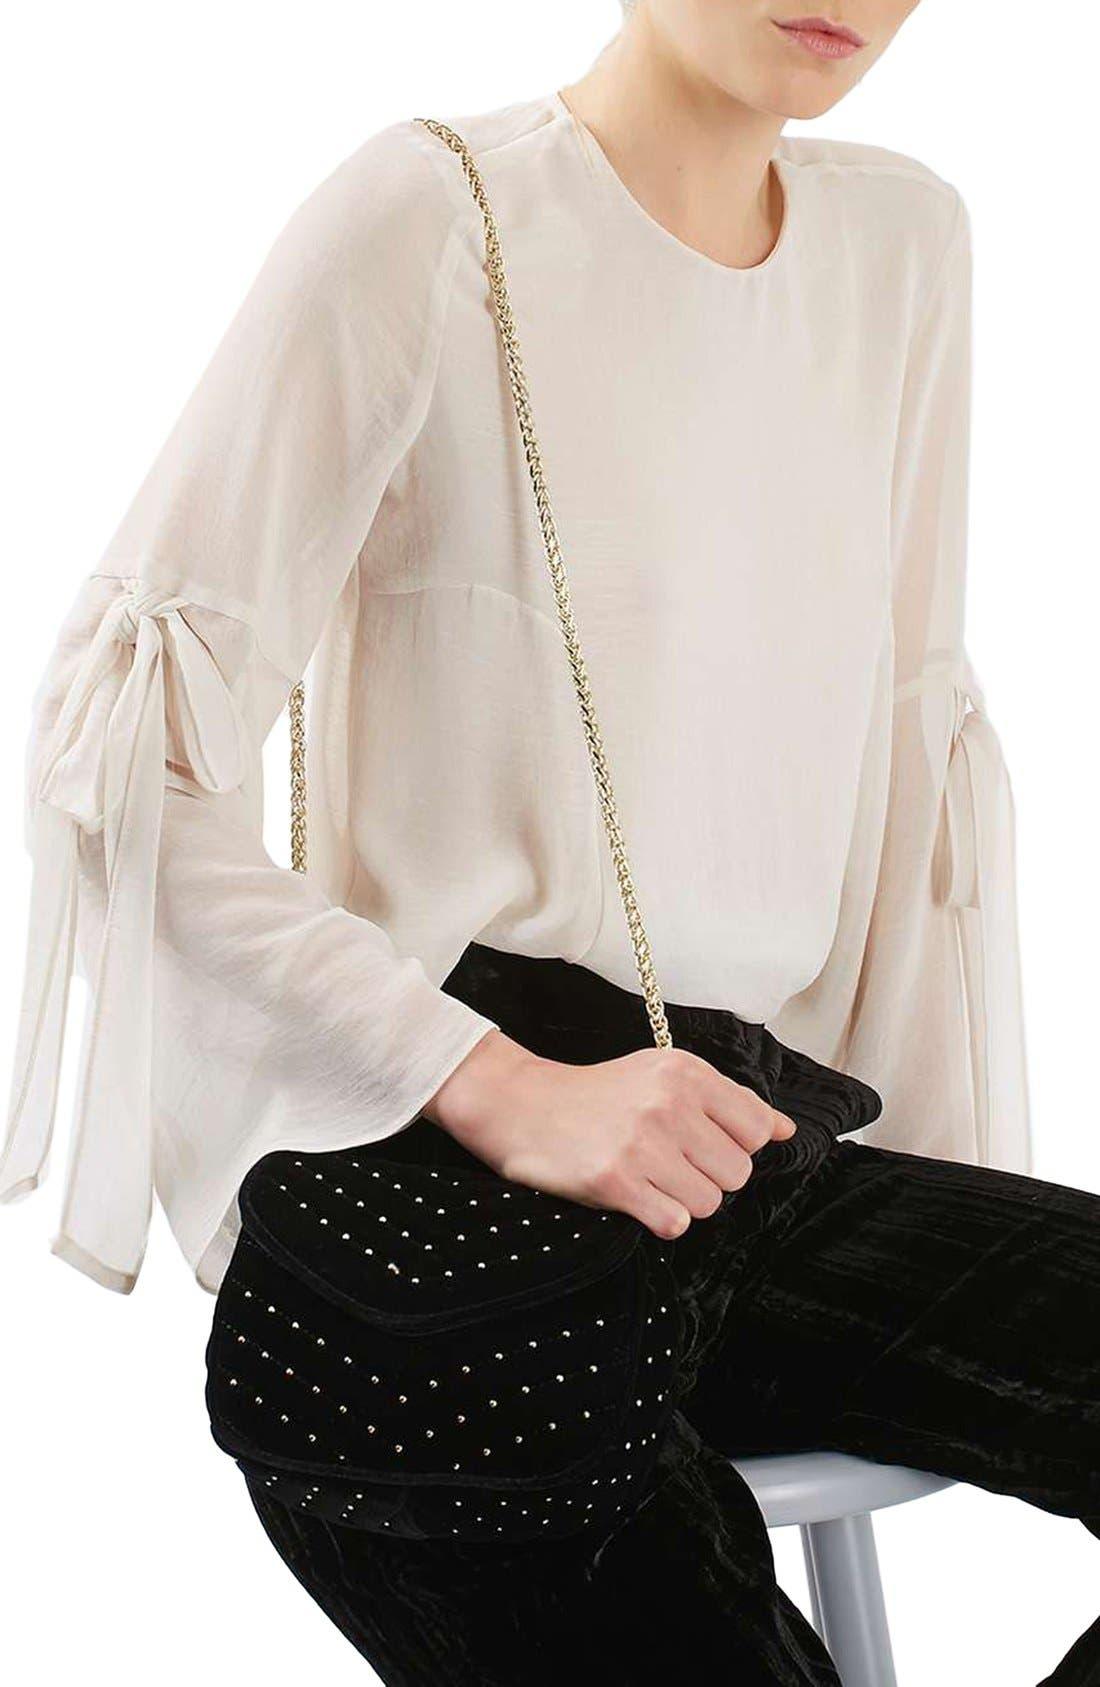 TOPSHOP, Embellished Velvet Crossbody Bag, Alternate thumbnail 3, color, 001